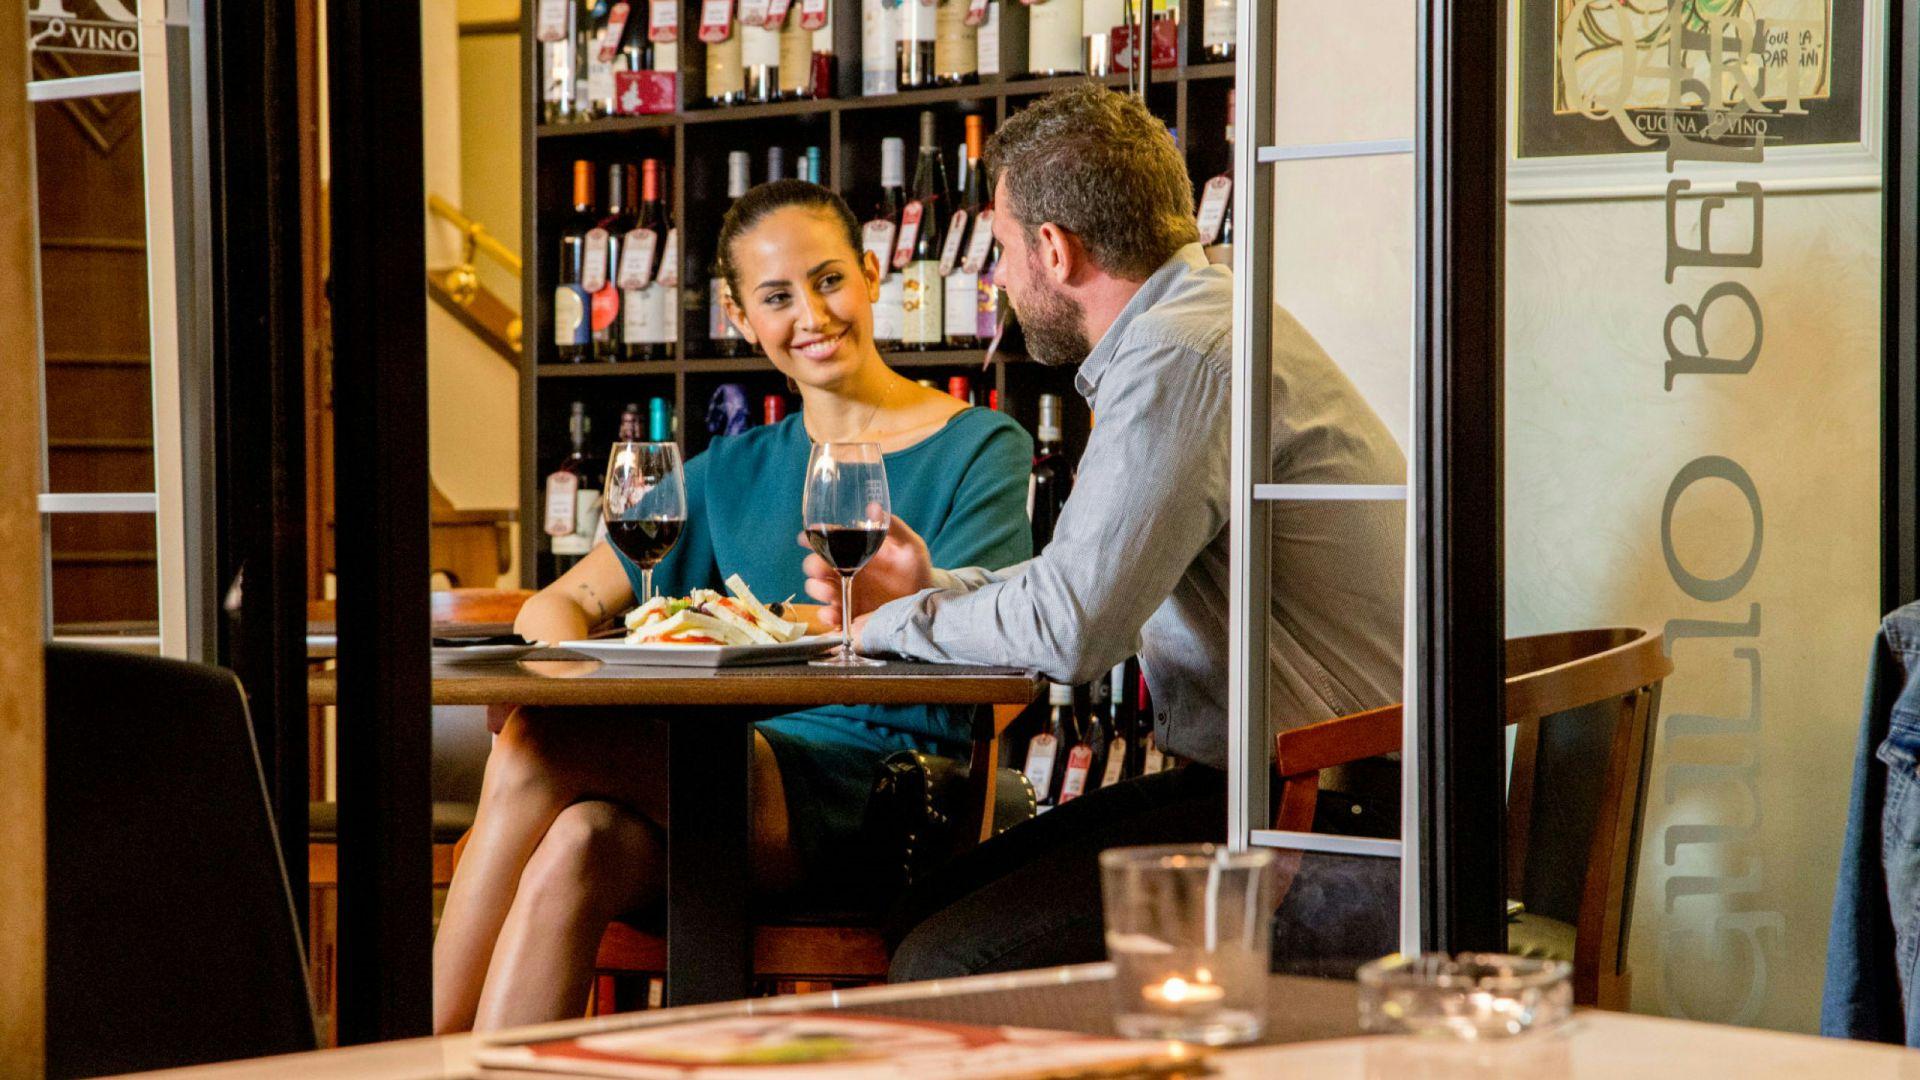 Foto-Hotel-Oxford-Roma-bar-de-vinhos-14